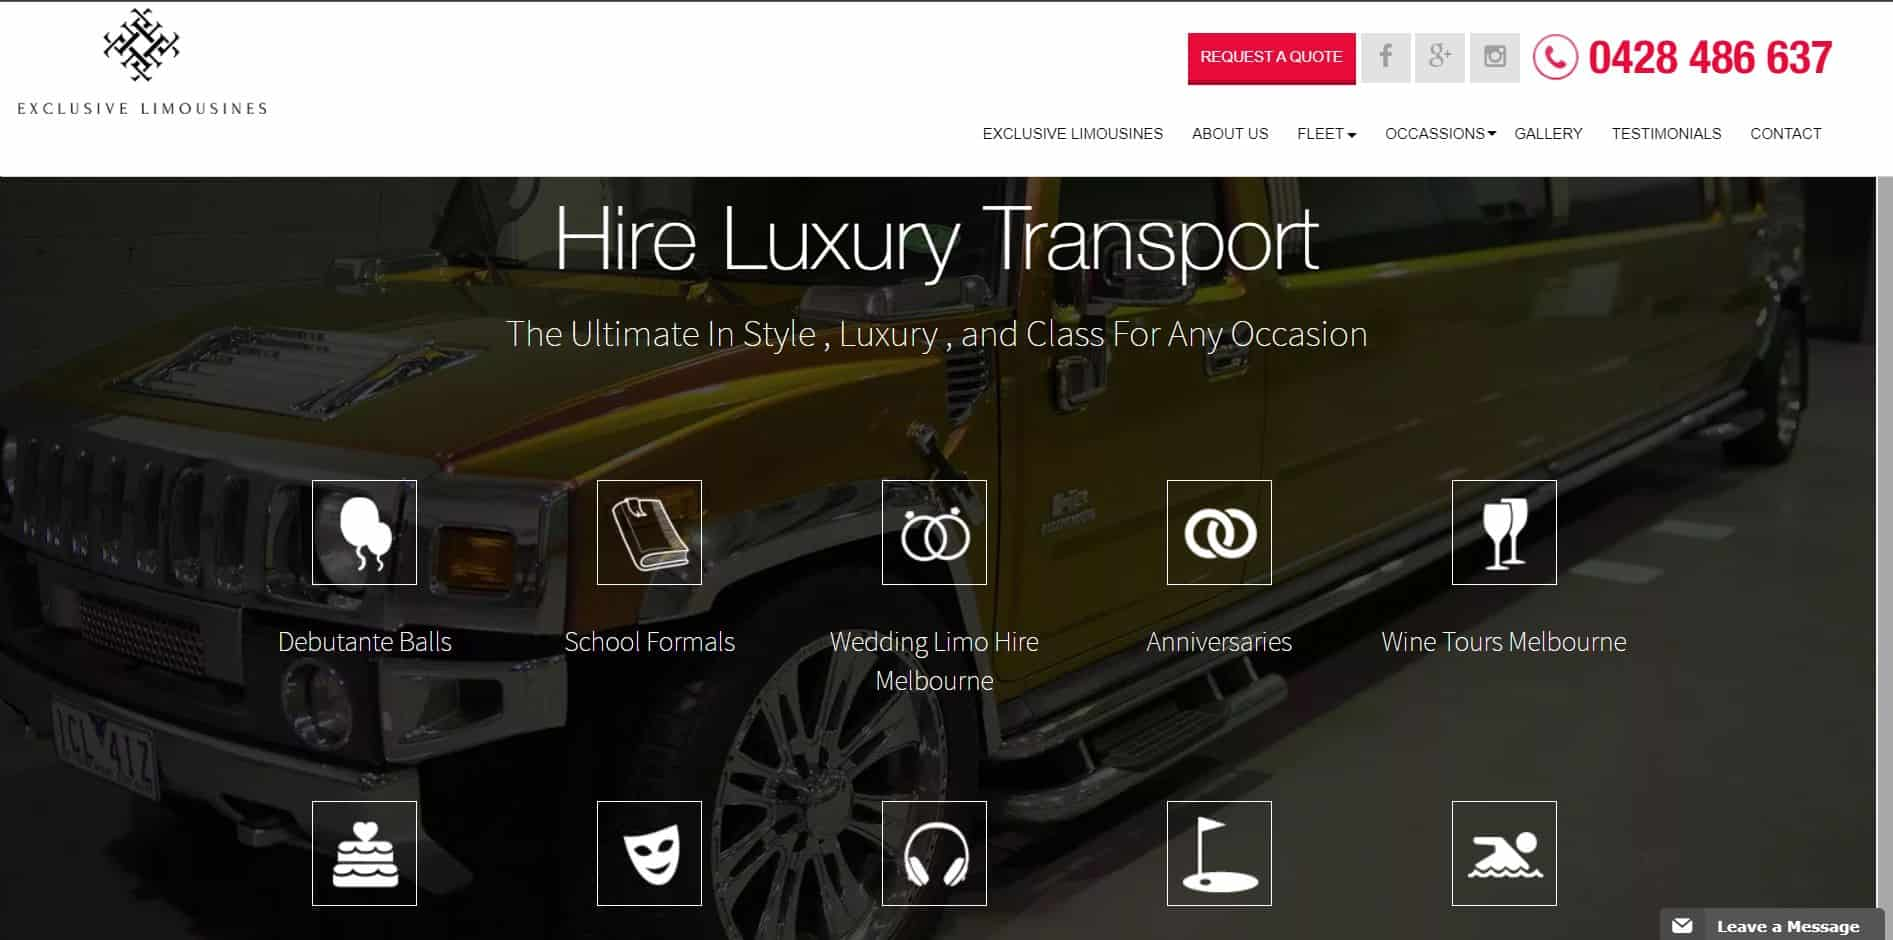 exclusive limousines & hummer hire melbourne